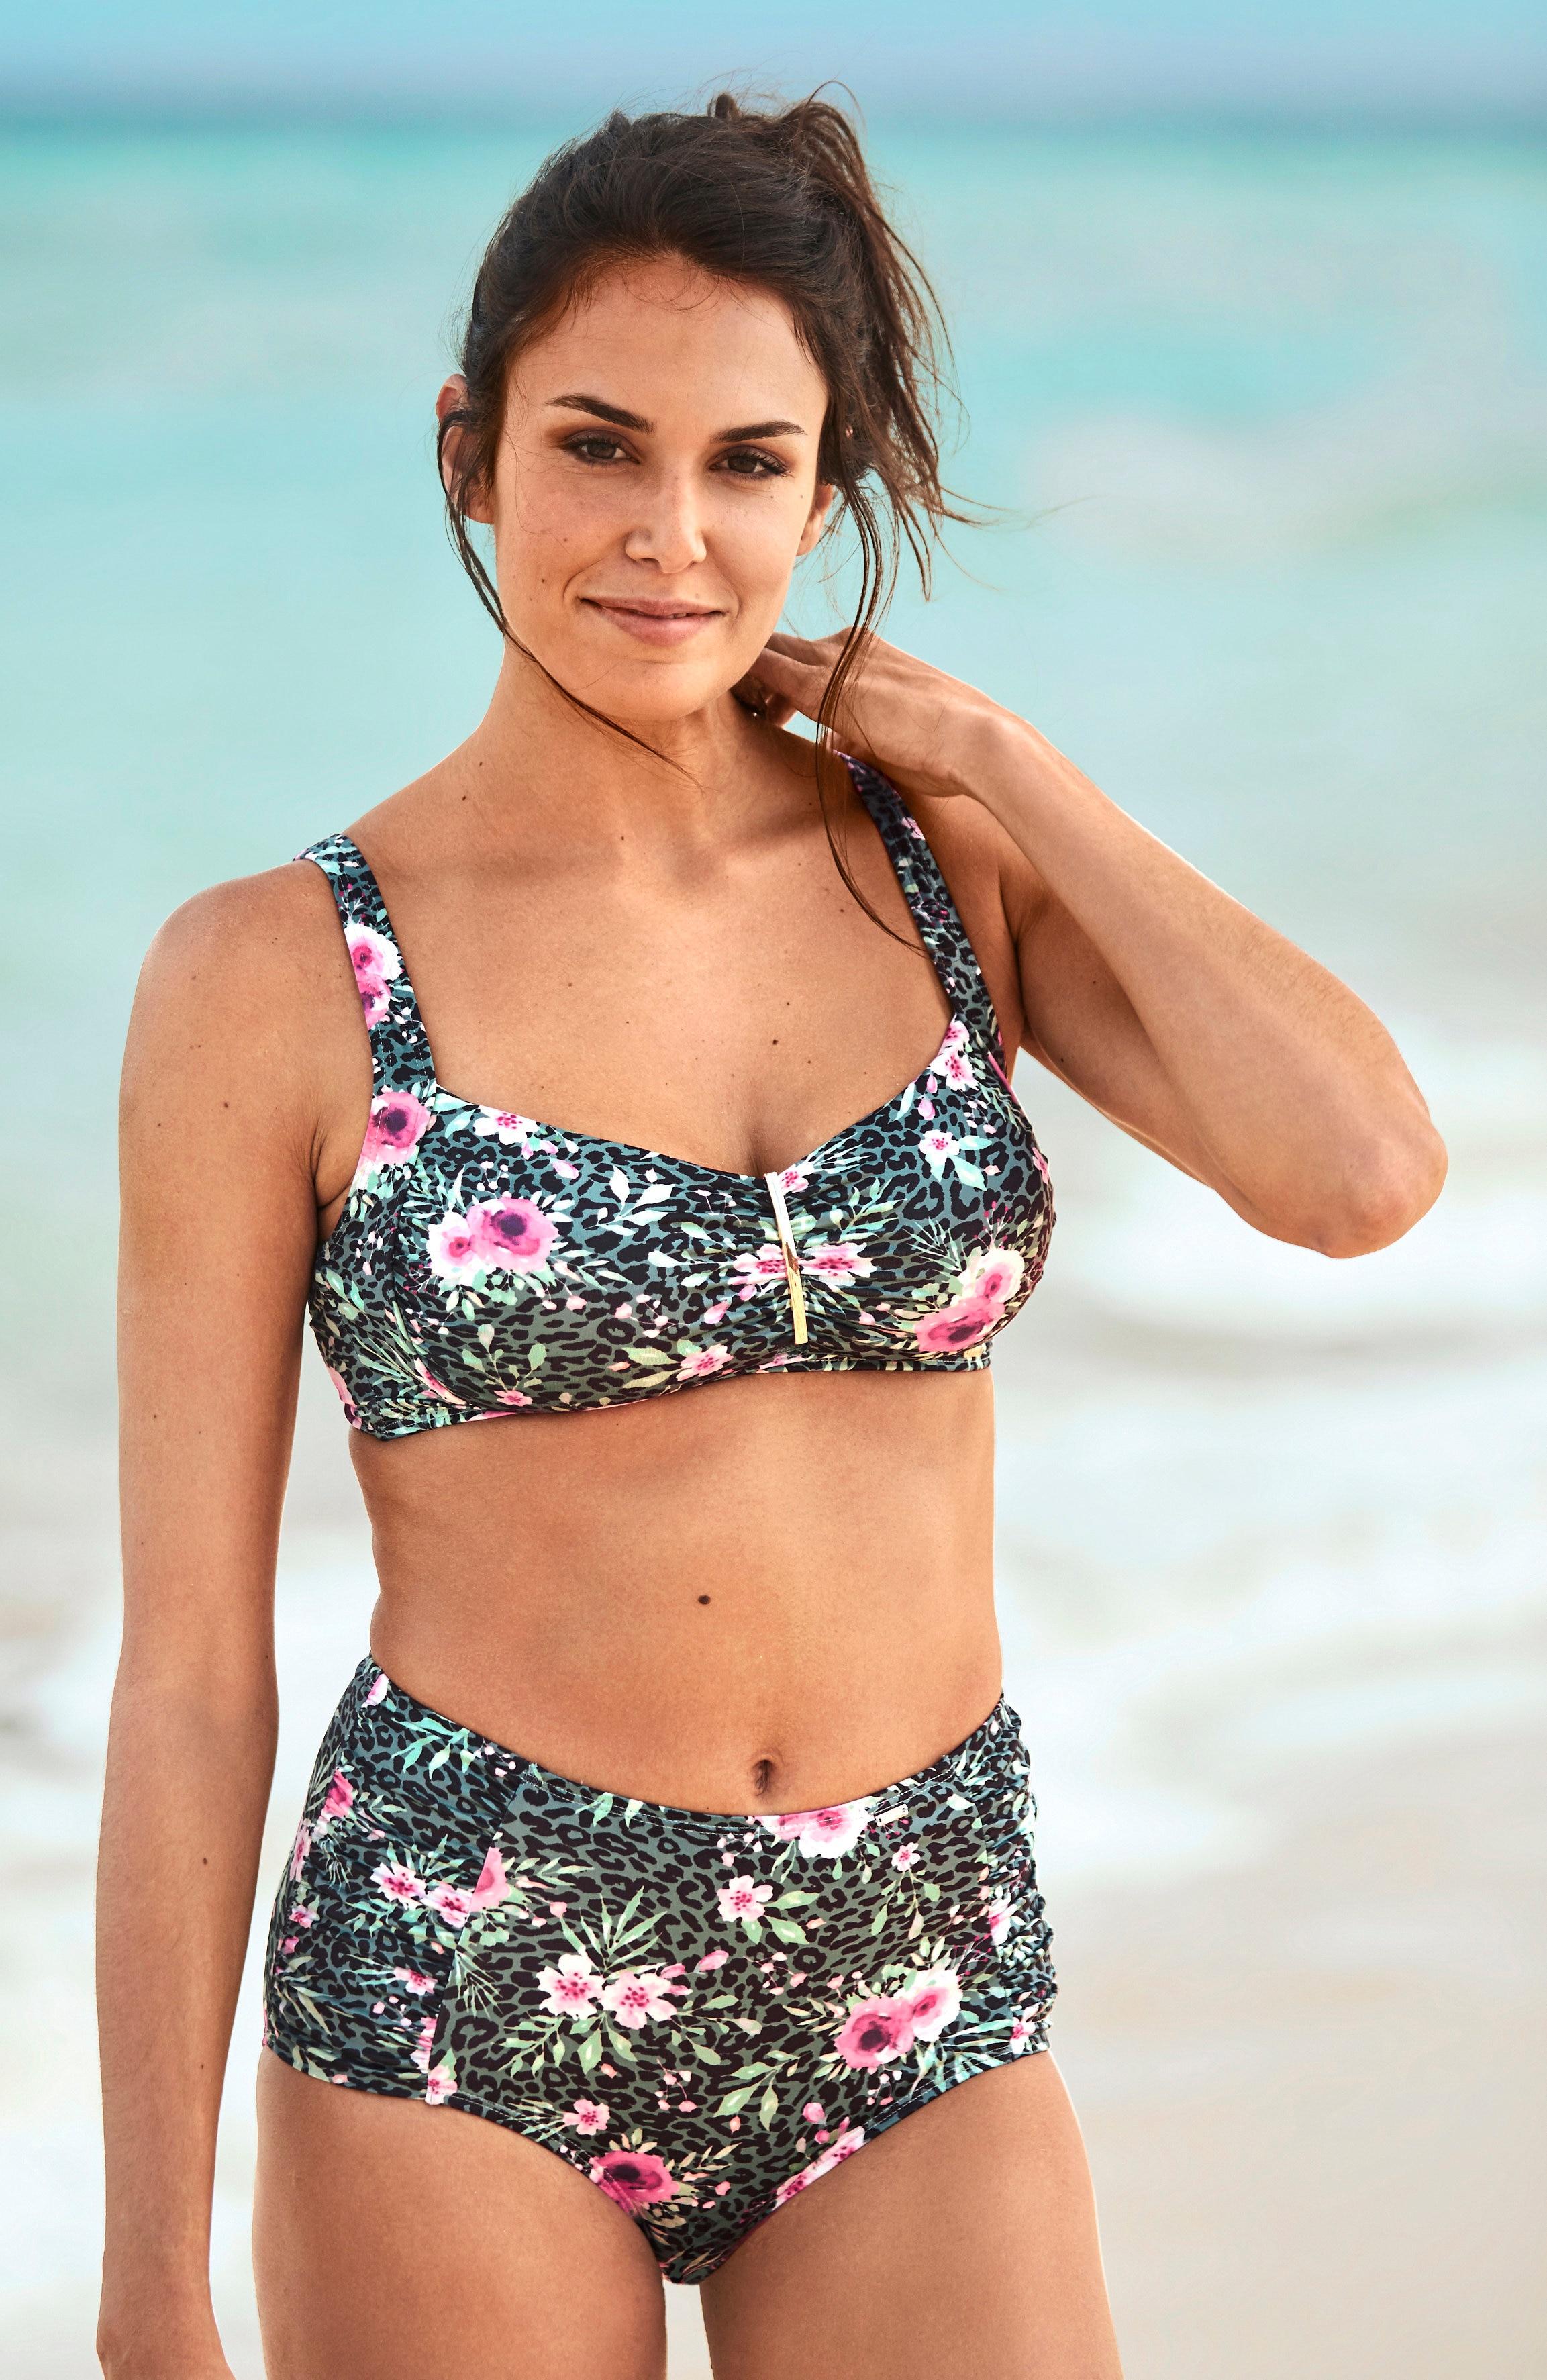 Blomstrete bikini-bh uten bøyle